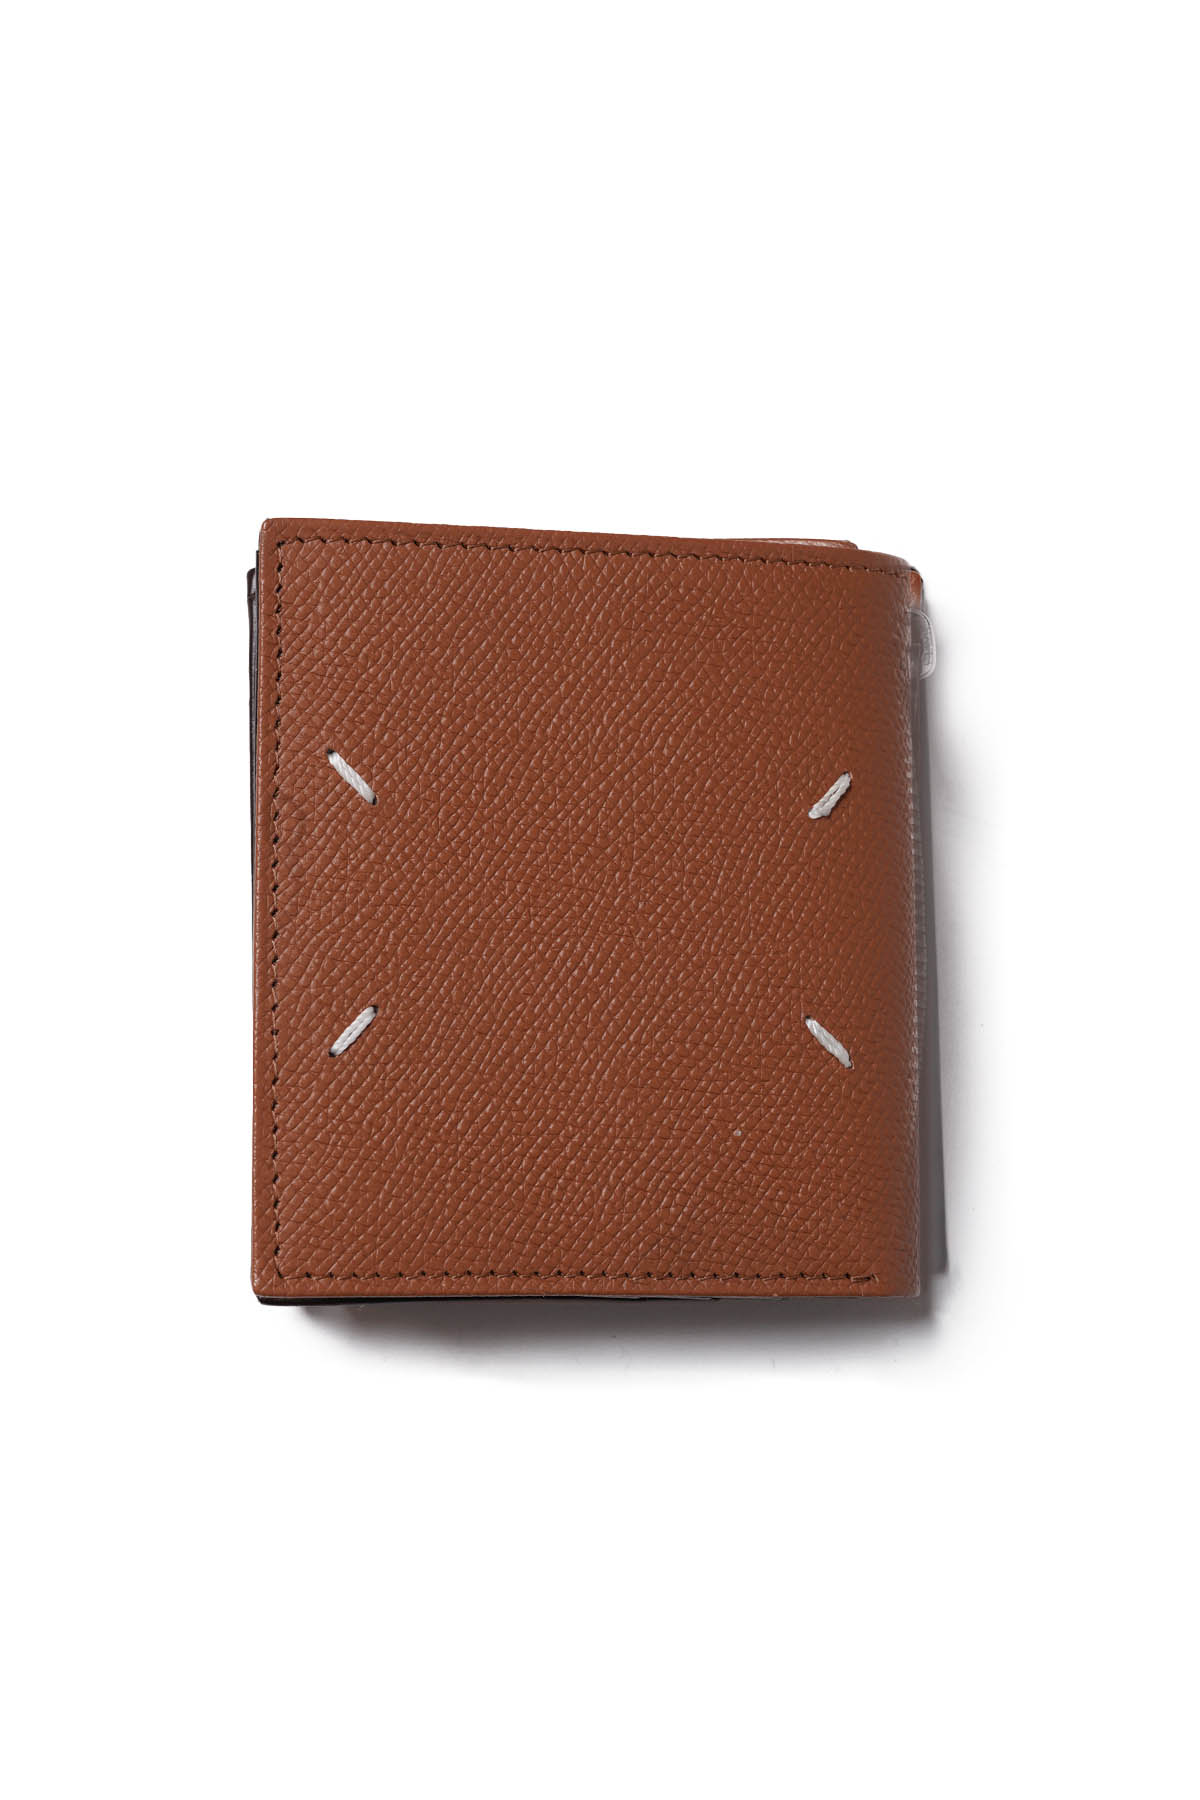 Bi-Fold Mini Wallet Brown[2021SS]